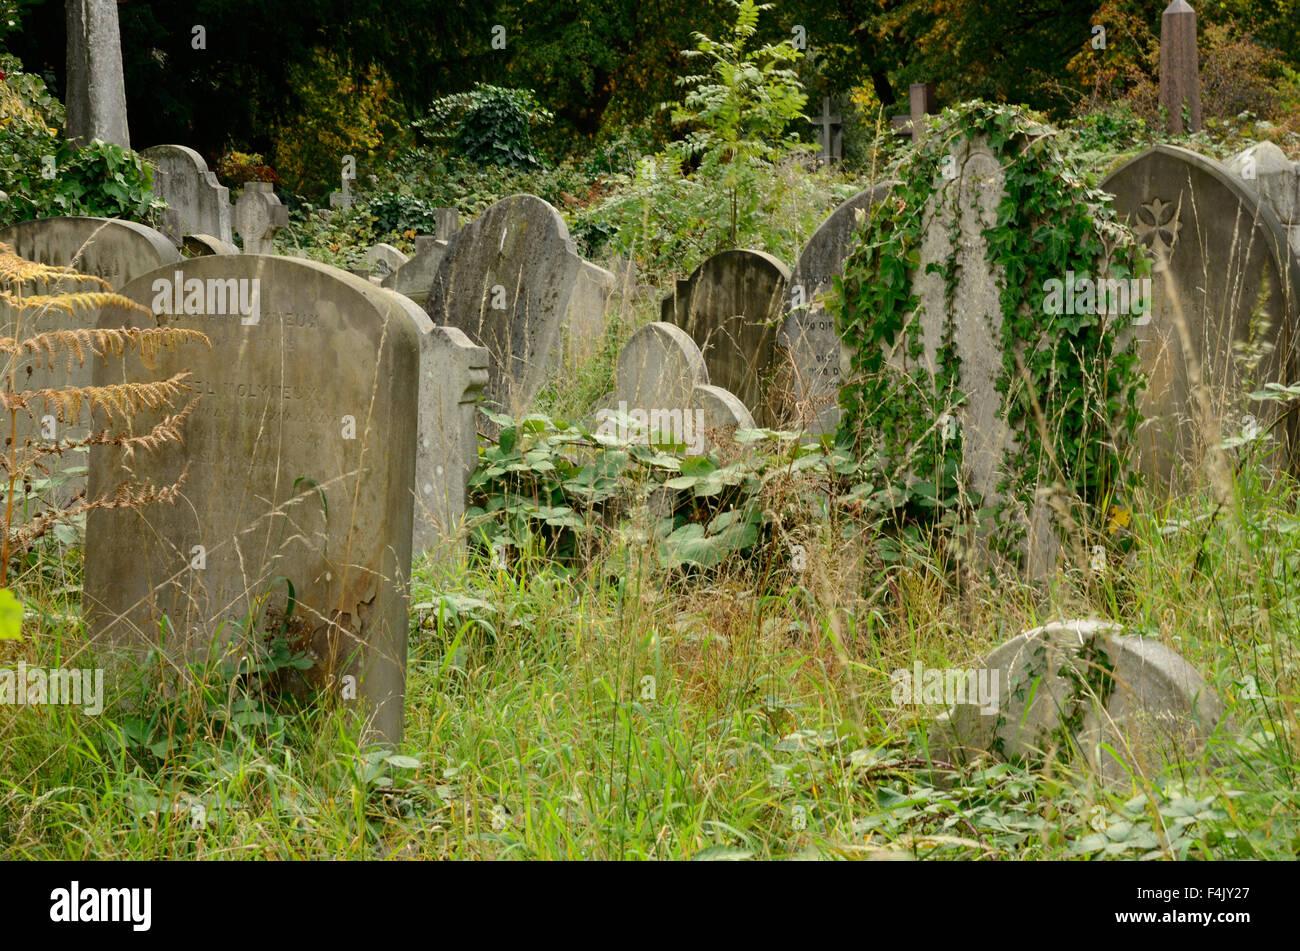 an-overgrown-graveyard-F4JY27.jpg